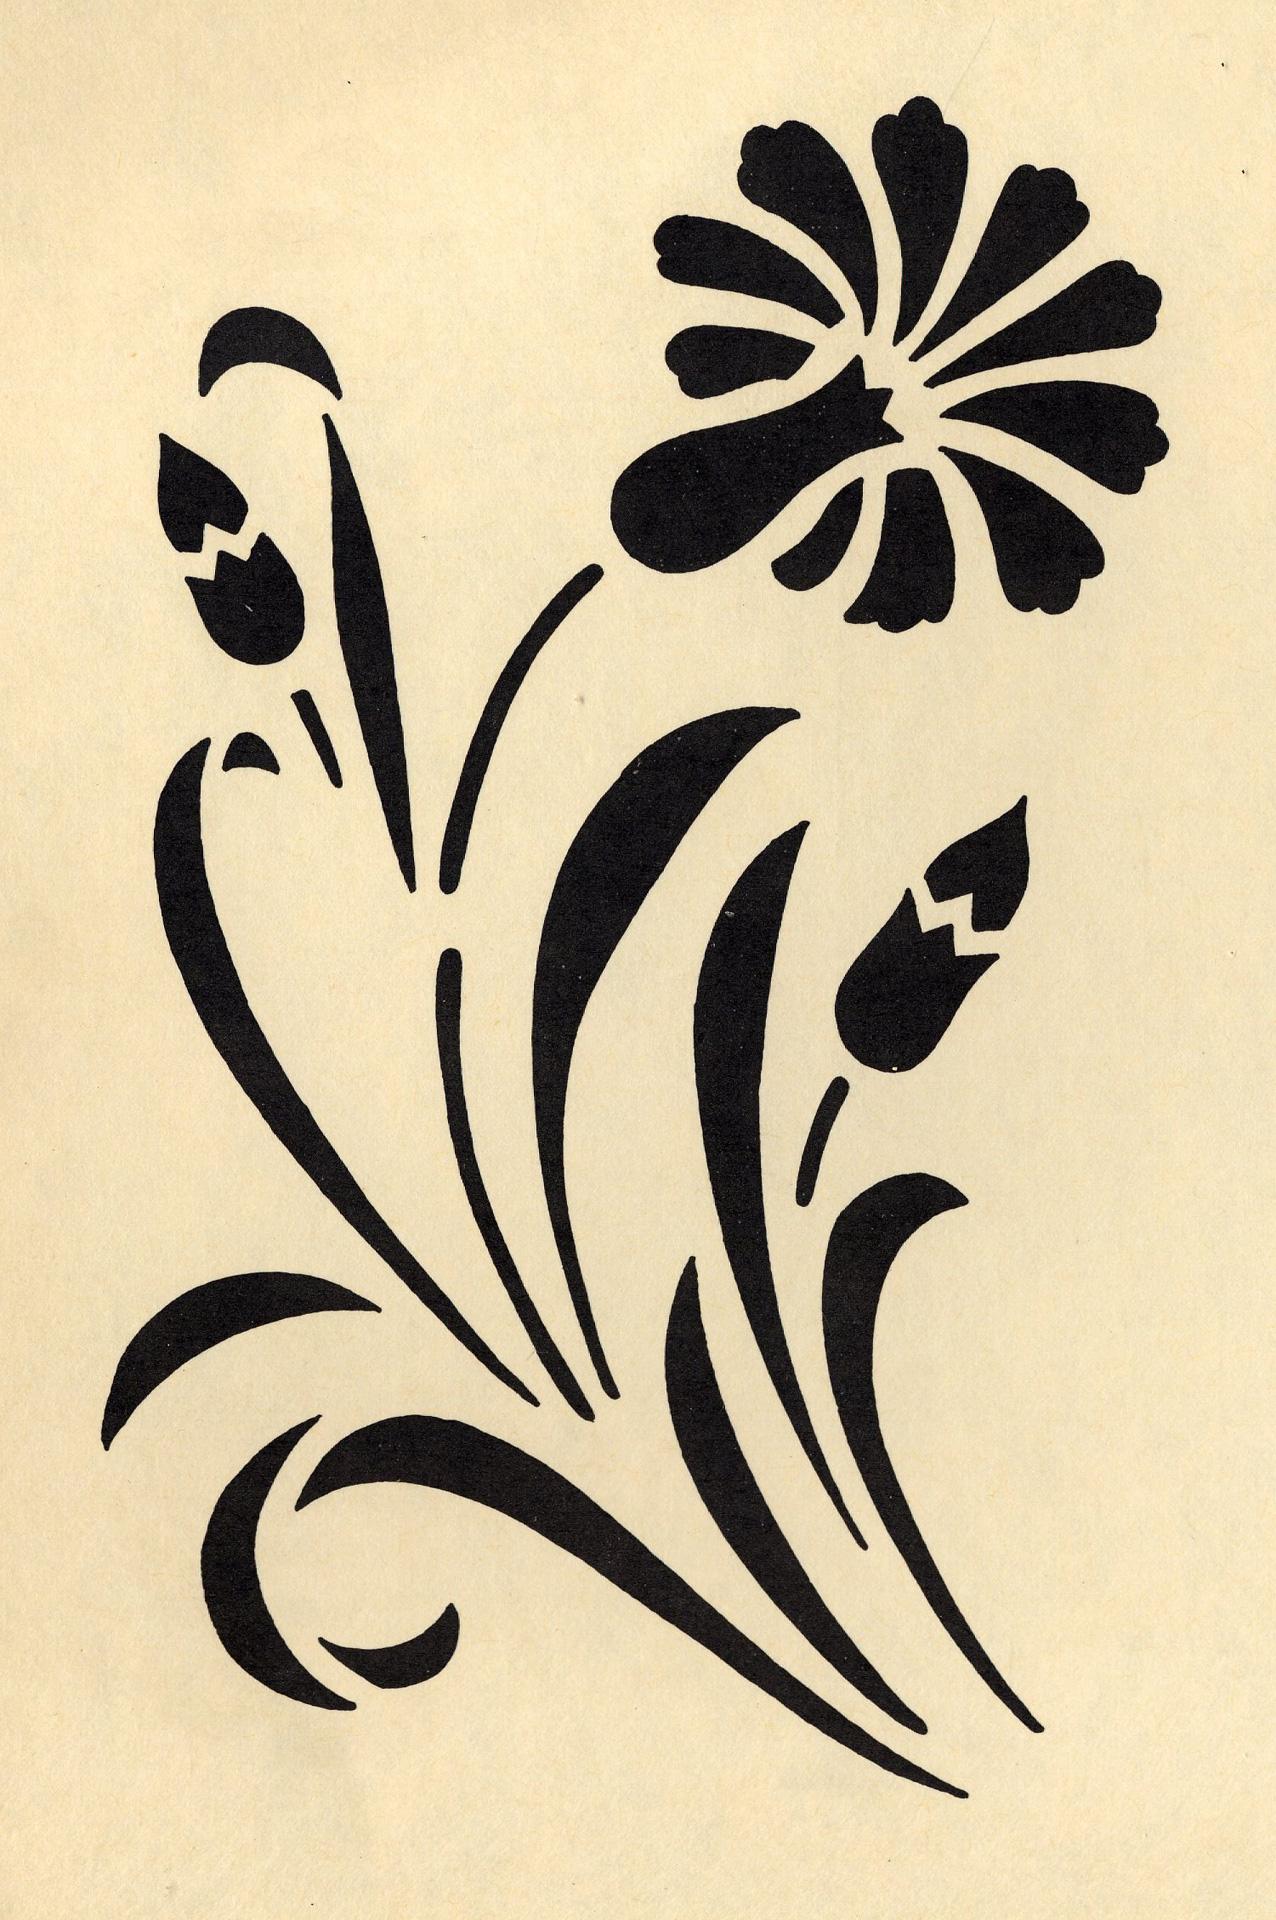 galerie des pochoirs fleurs loisirs creatifs de f1adc. Black Bedroom Furniture Sets. Home Design Ideas